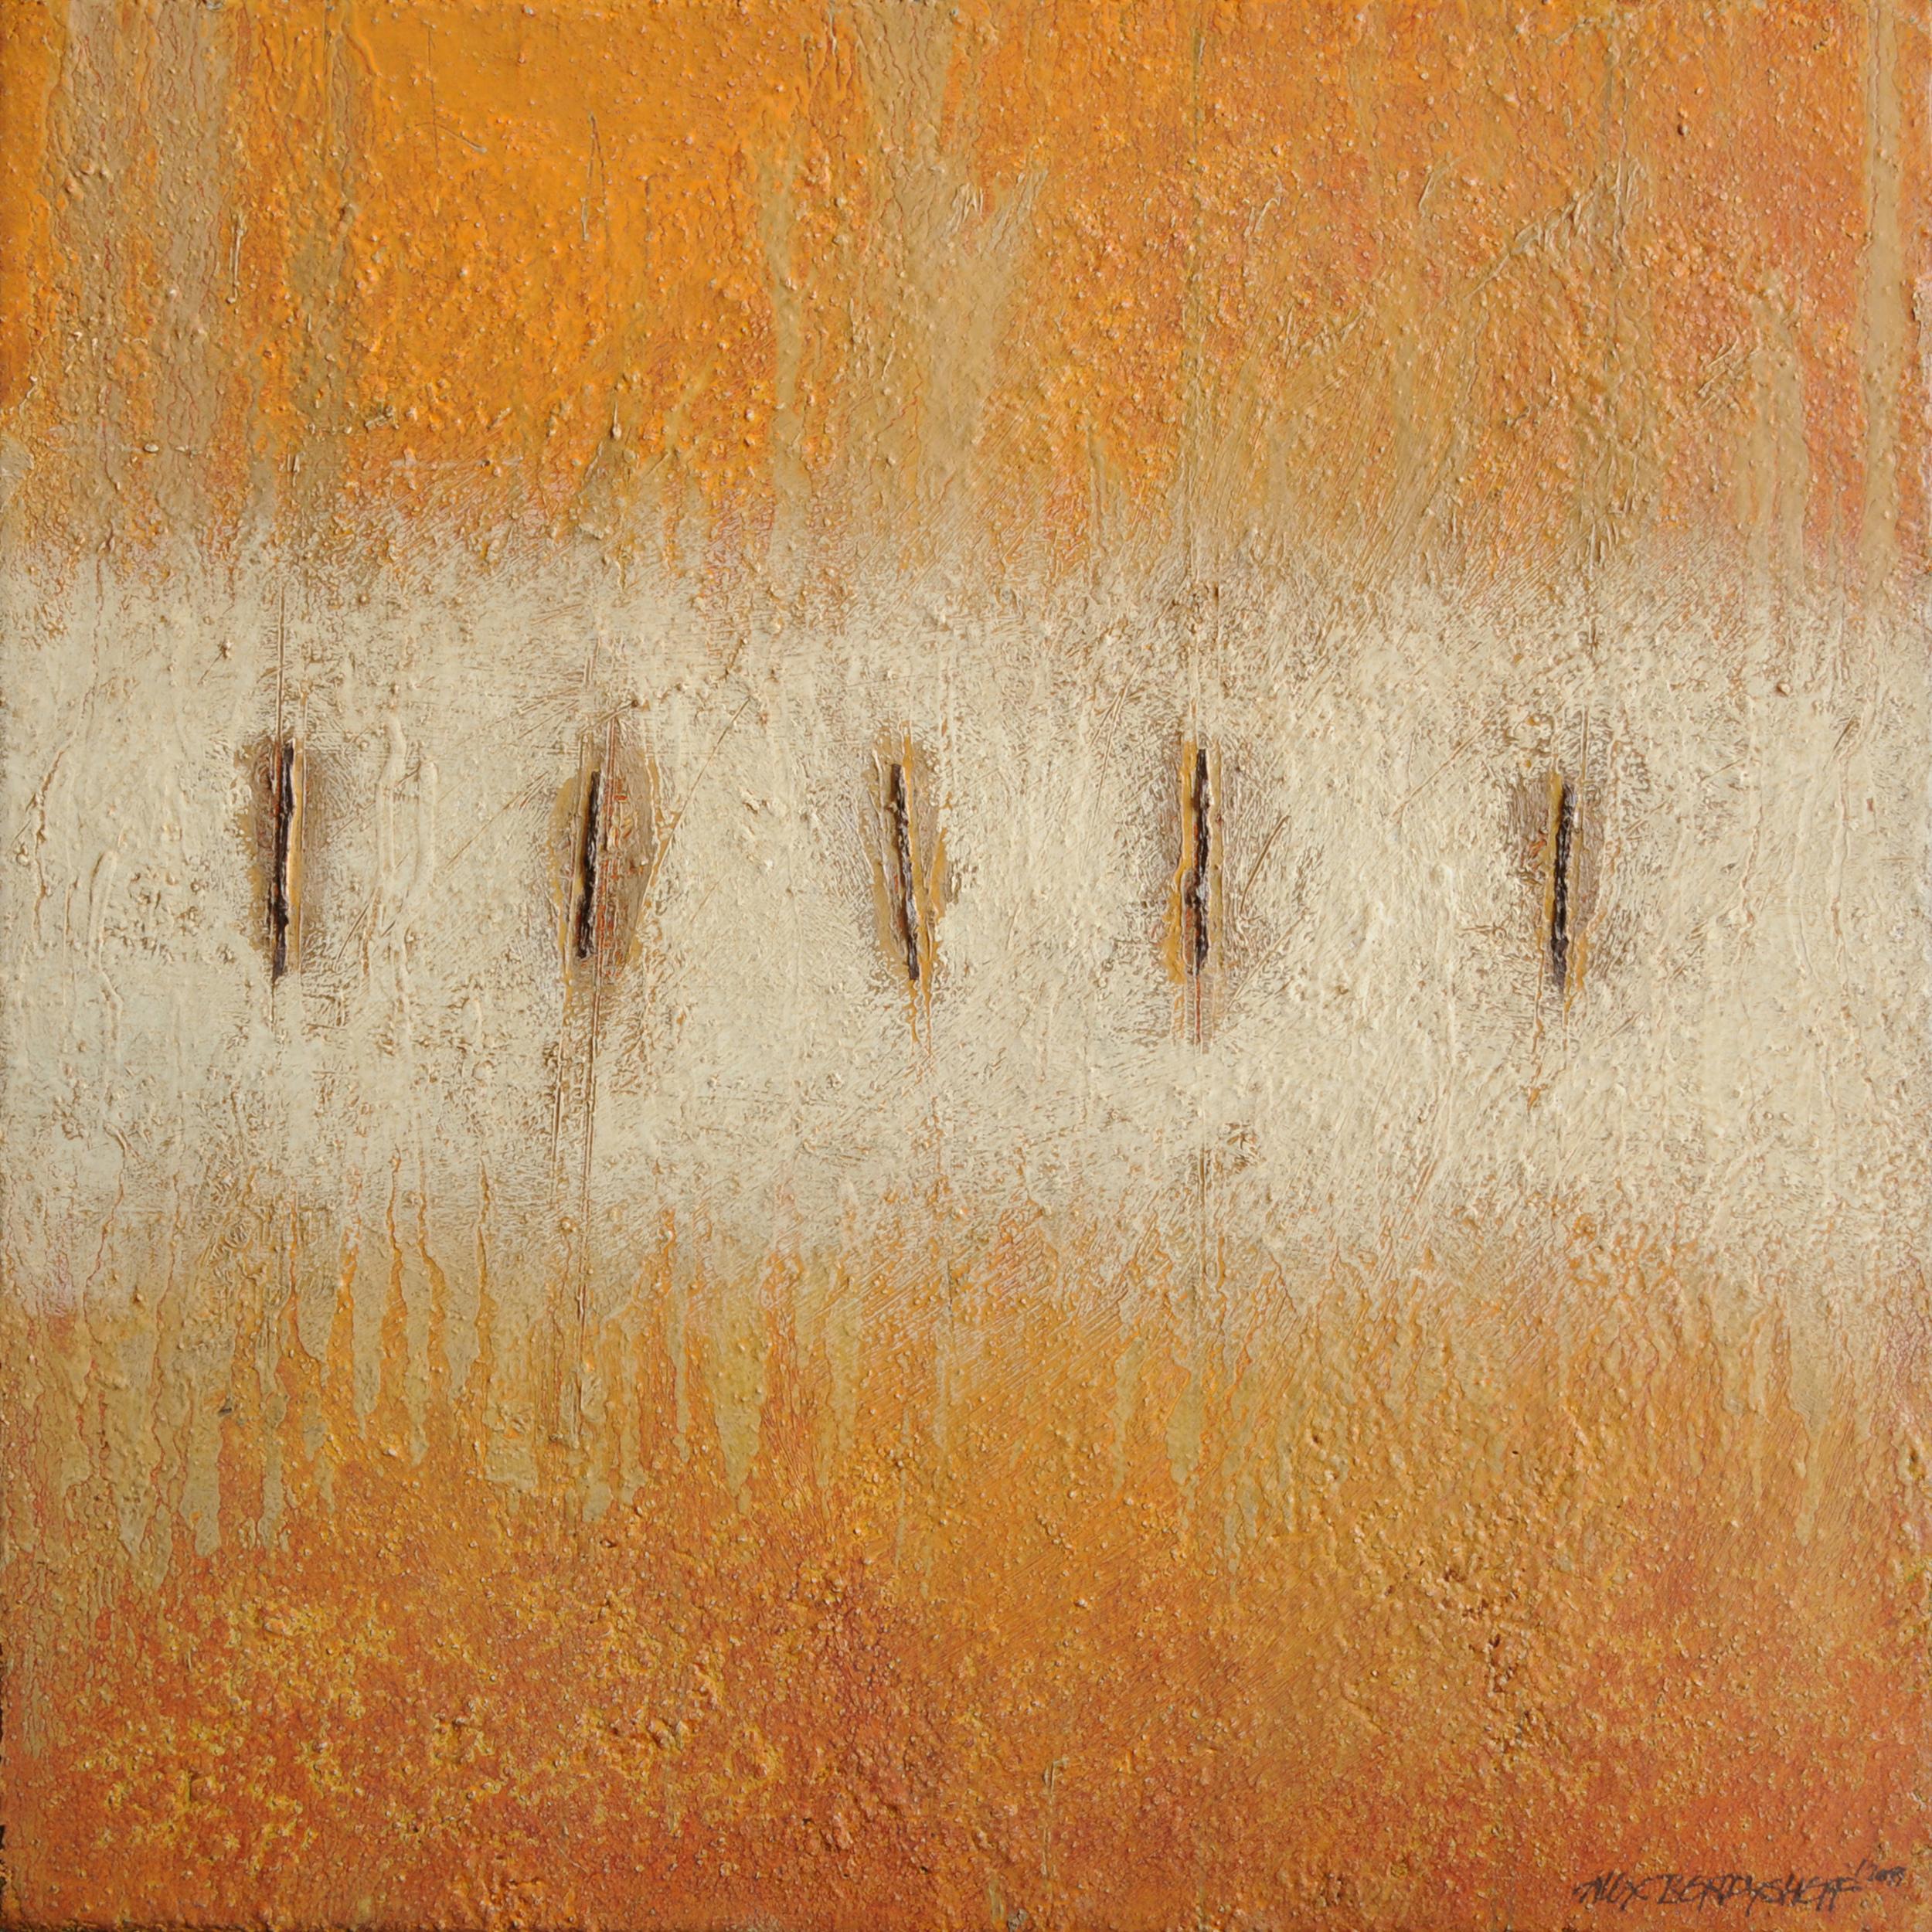 Terra III, oil on canvas, 46x46 cm, 2011